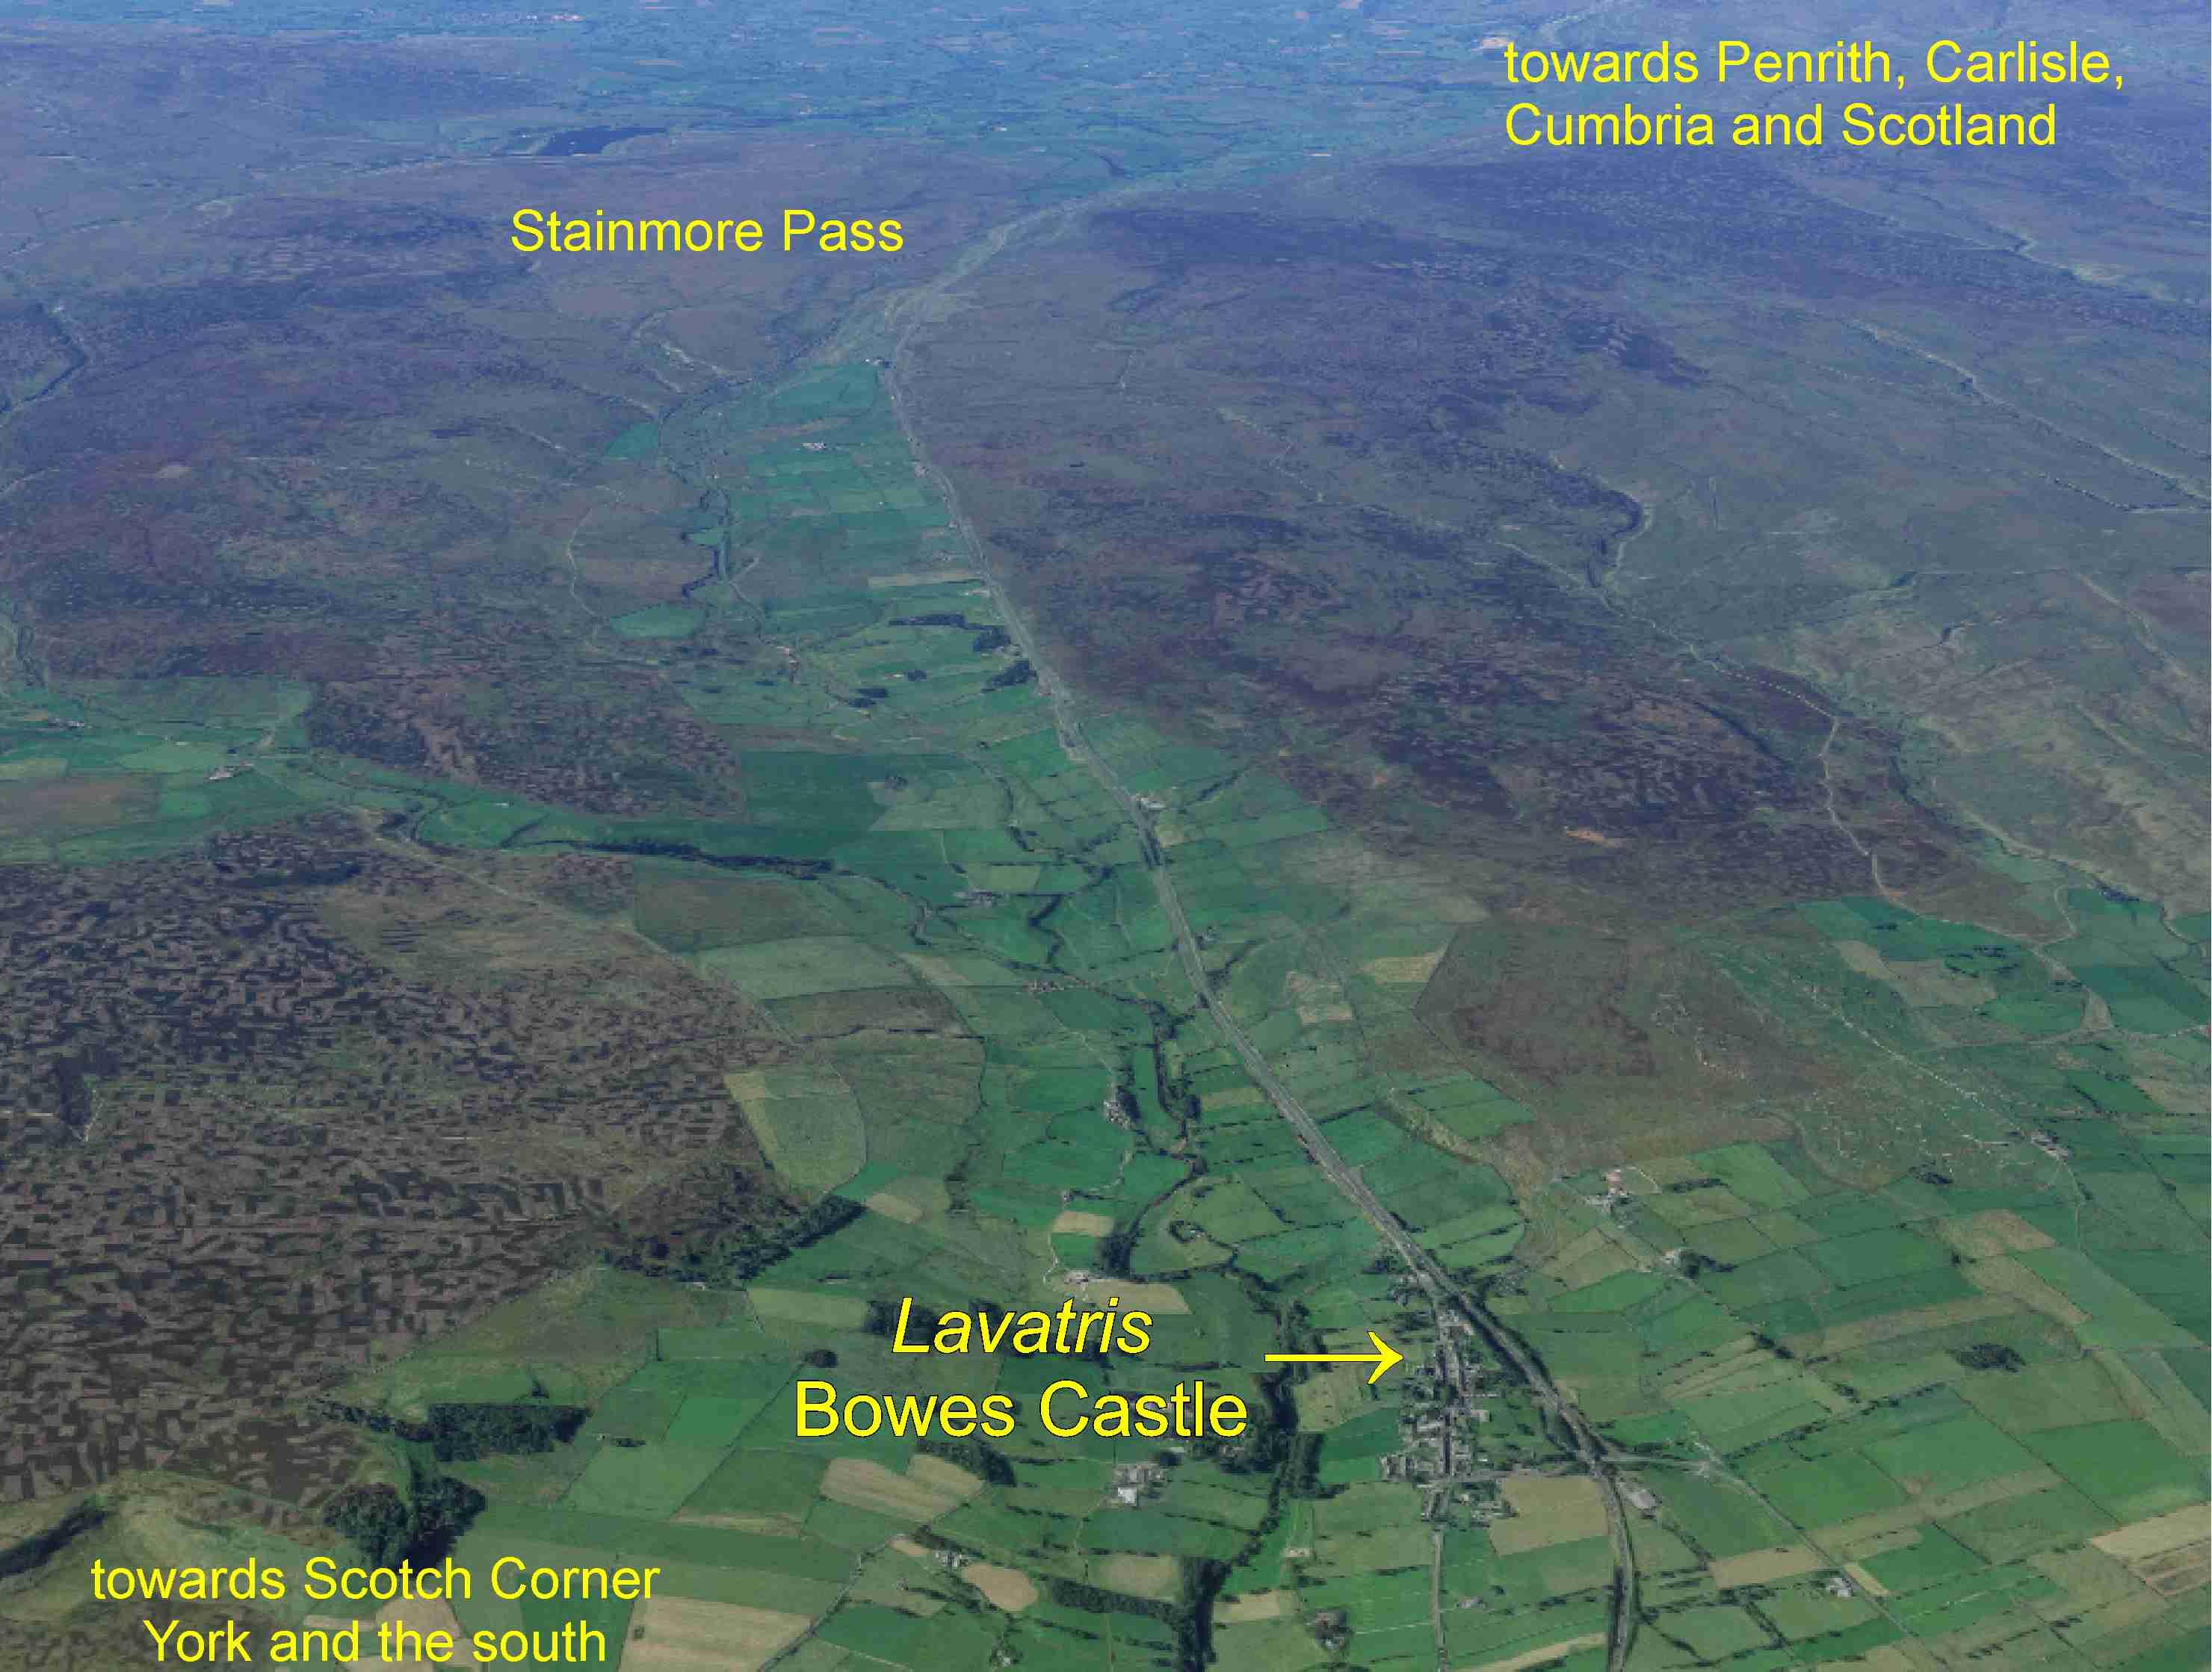 [Lavatris map here]